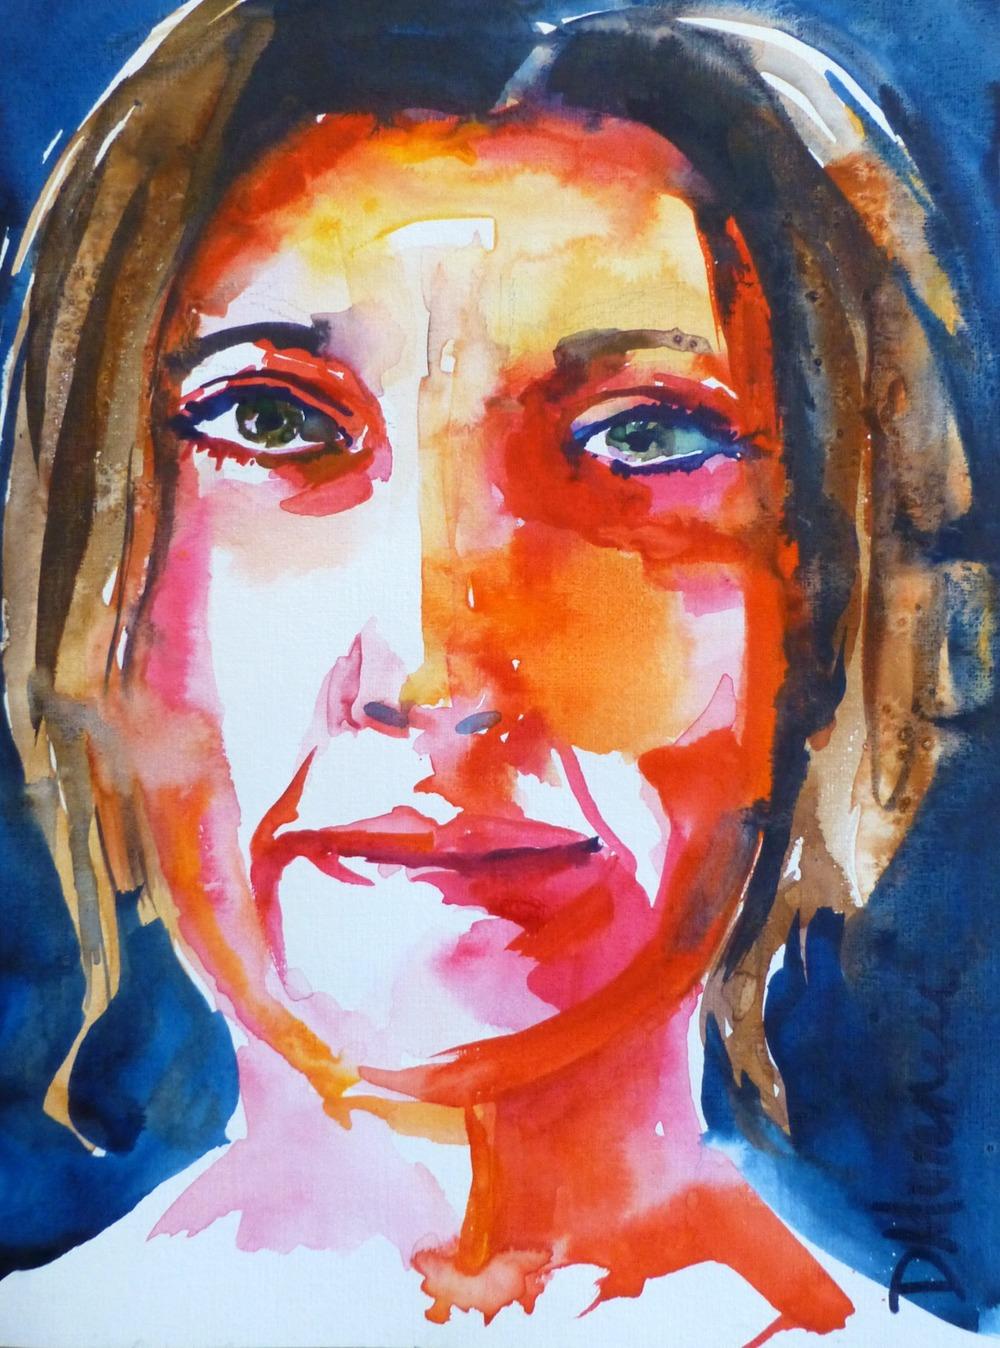 nwm - Sketch - Self Portrait3.jpg